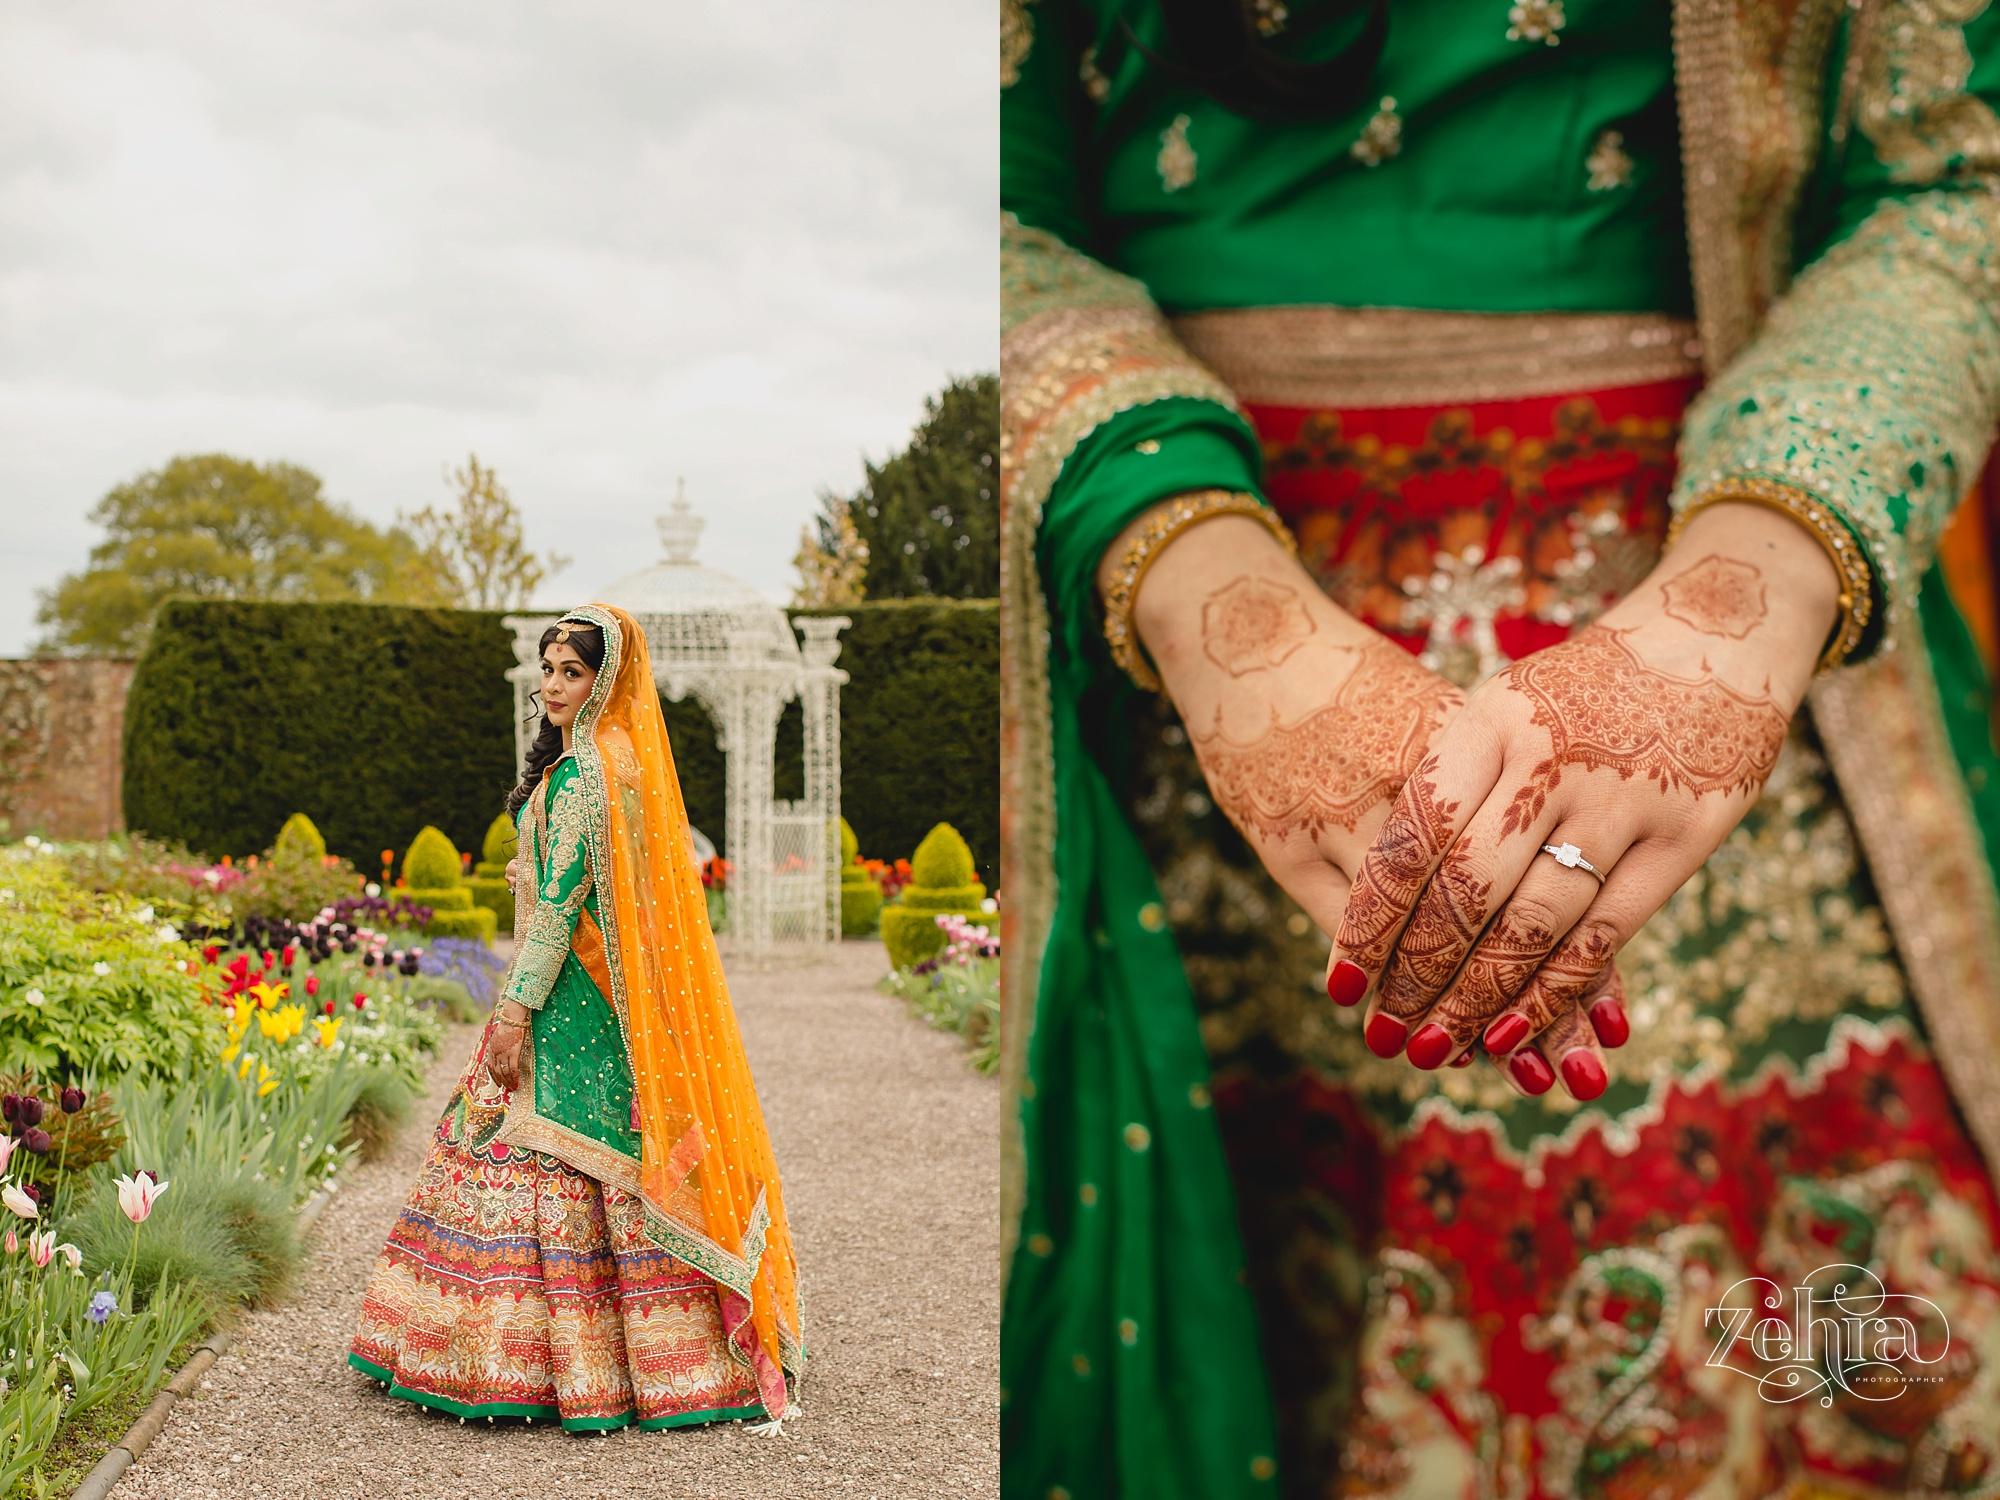 zehra wedding photographer arley hall cheshire009.jpg